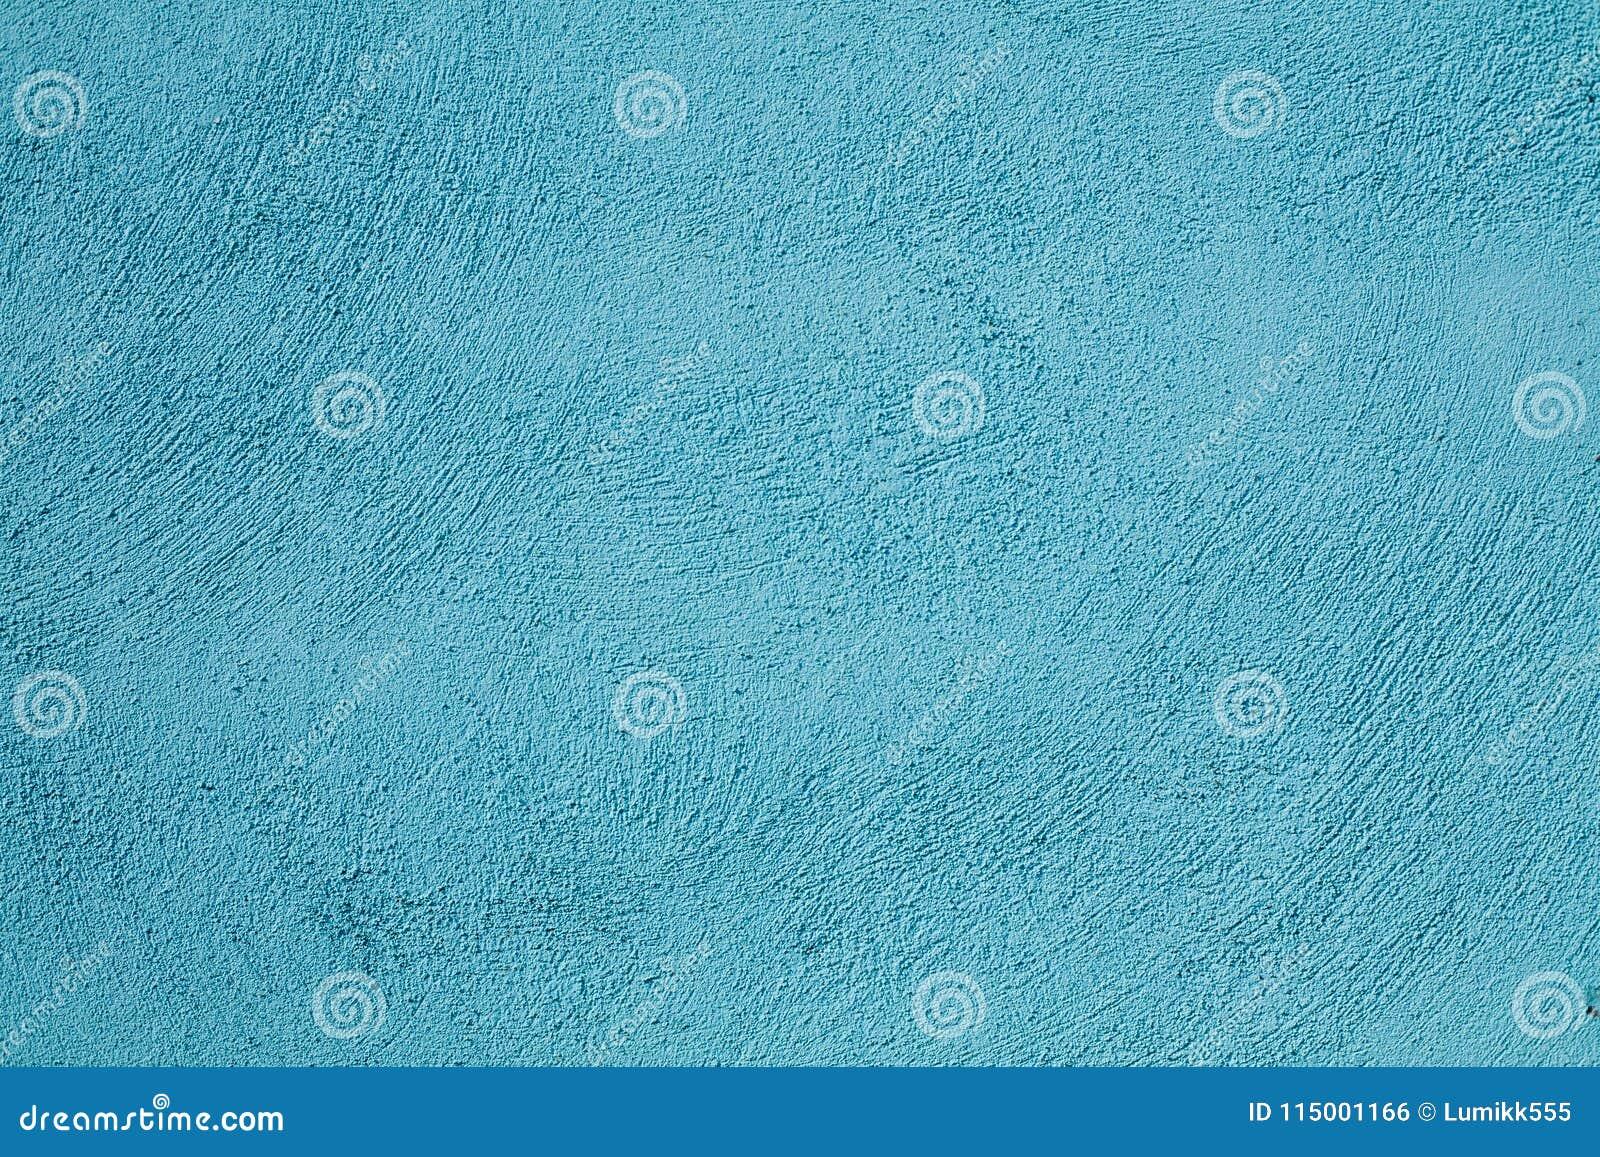 Beautiful Vintage Light Blue Background Stock Photo Image Of Paper